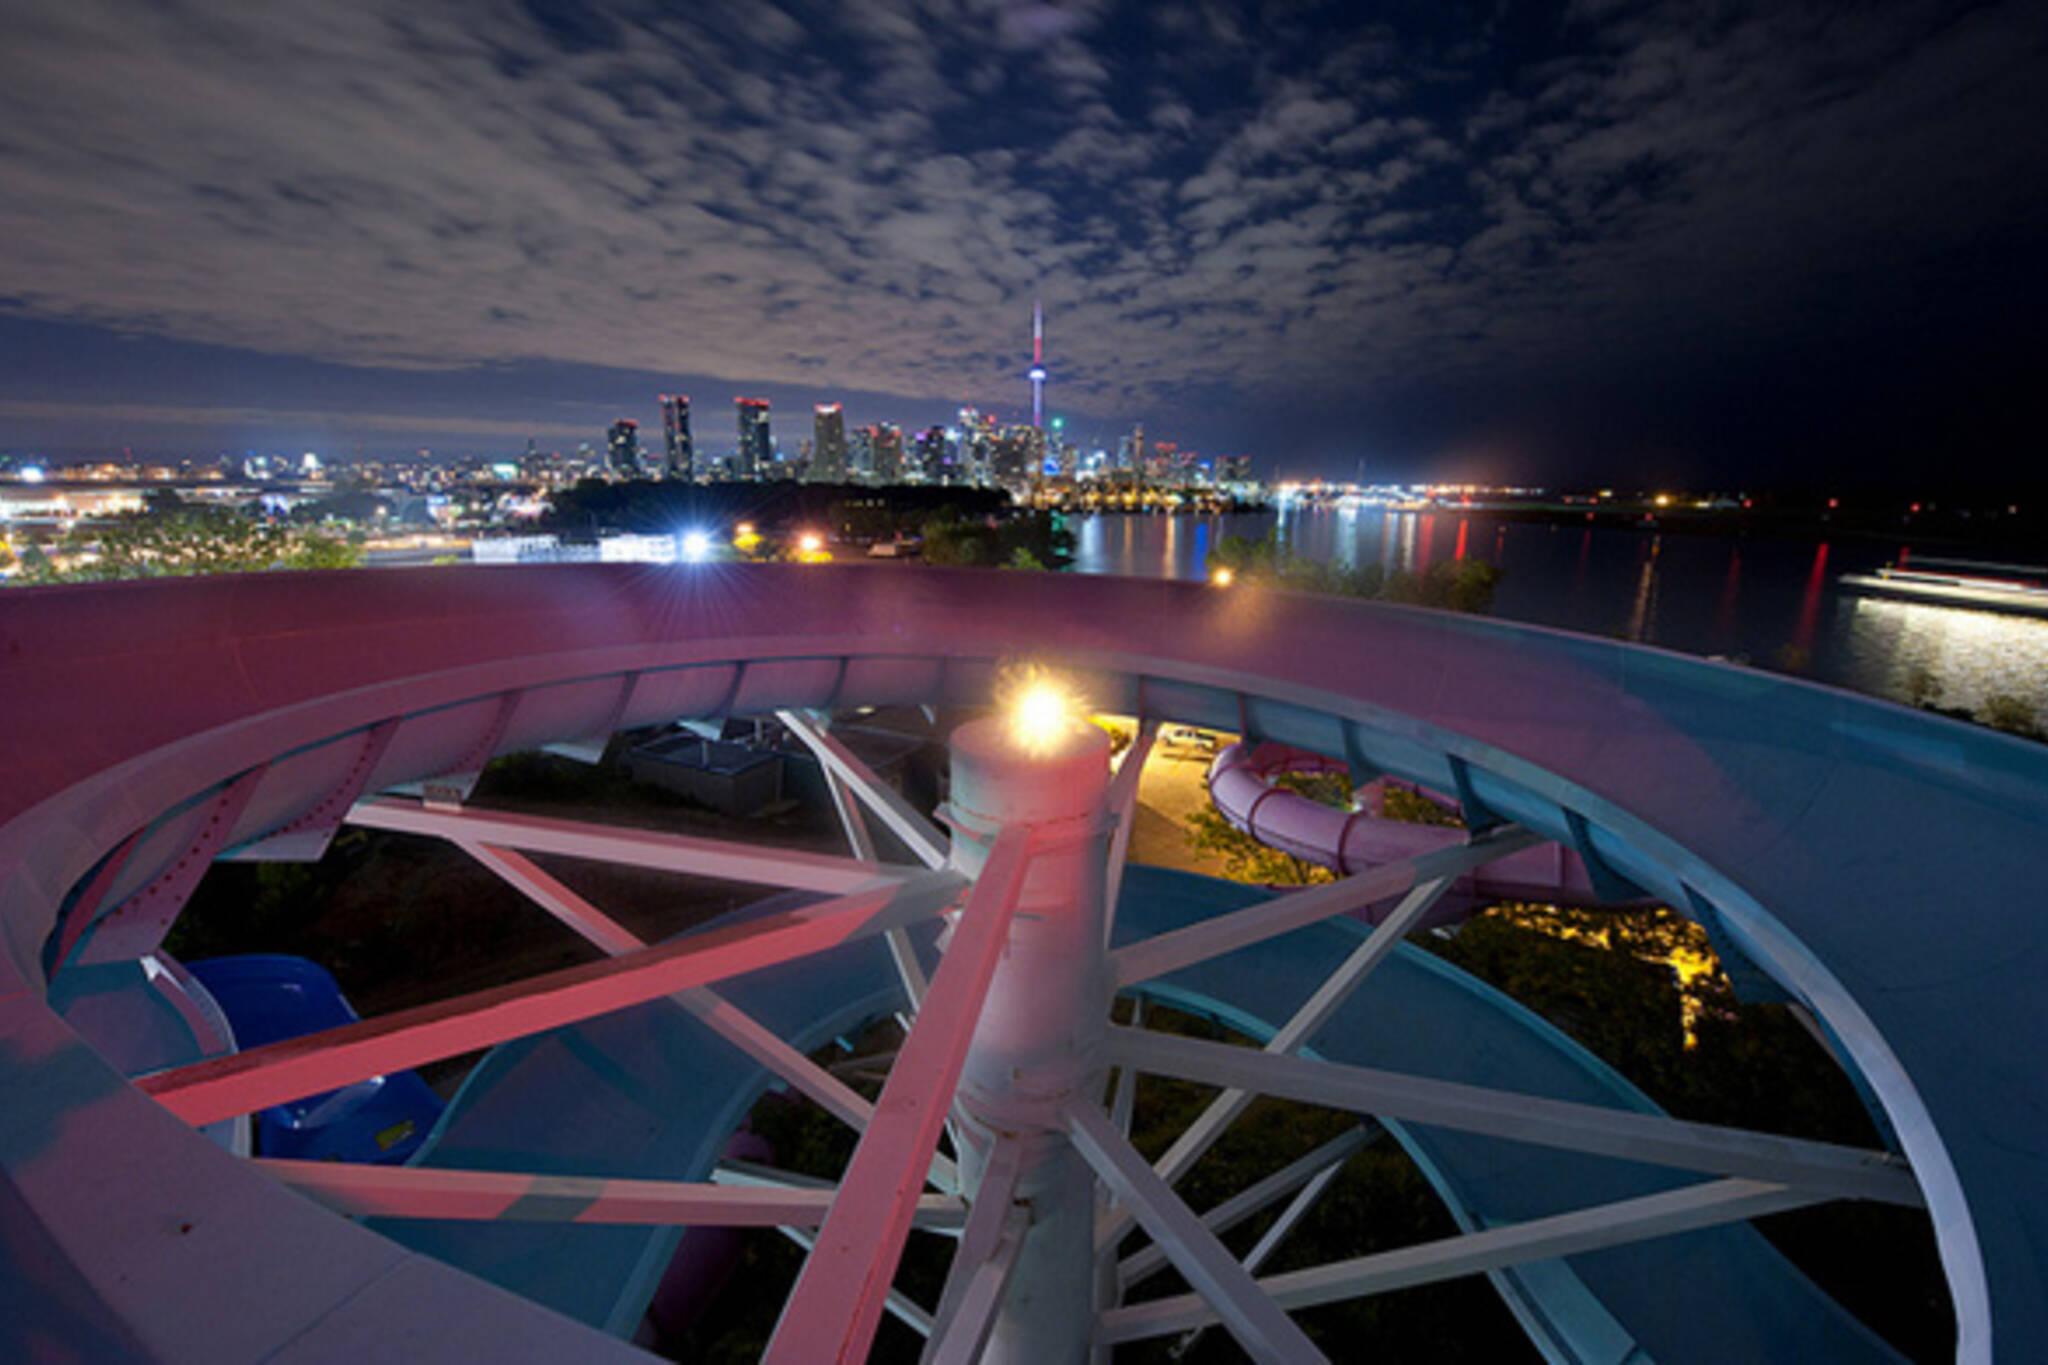 Ontario Place Slide